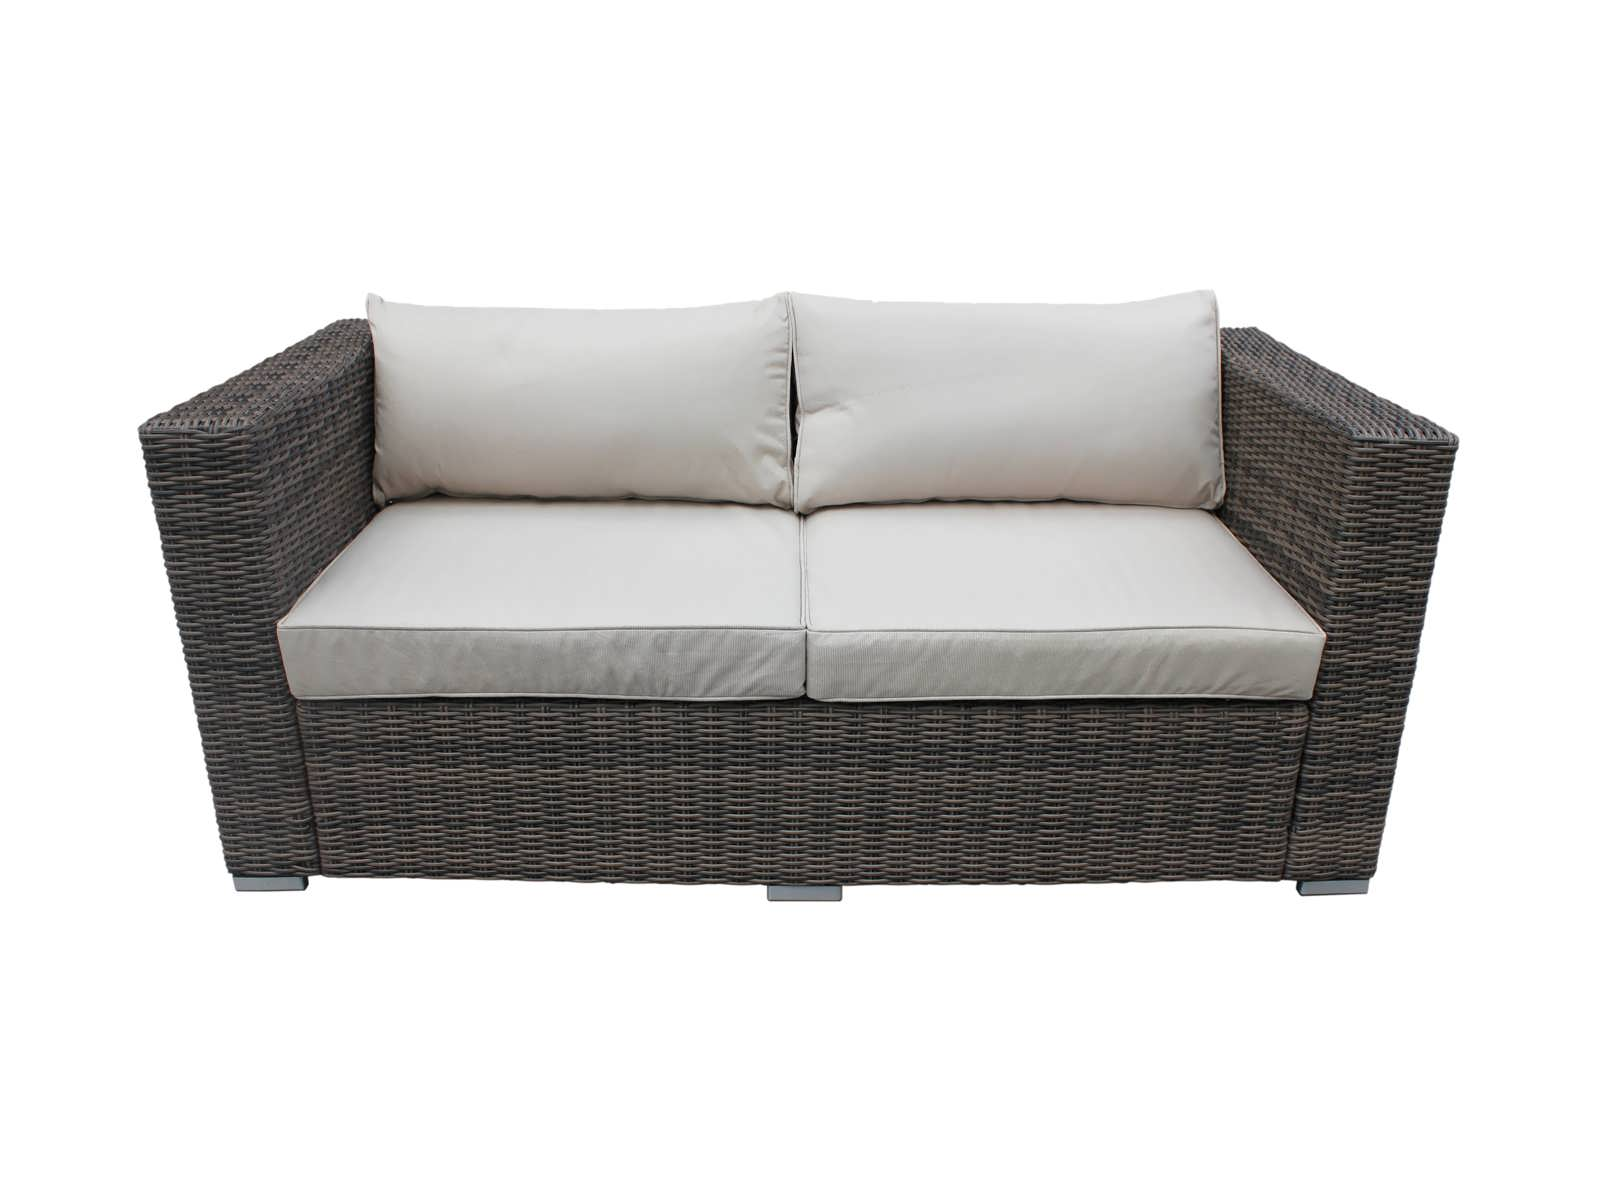 2 seater rattan sofa. Black Bedroom Furniture Sets. Home Design Ideas